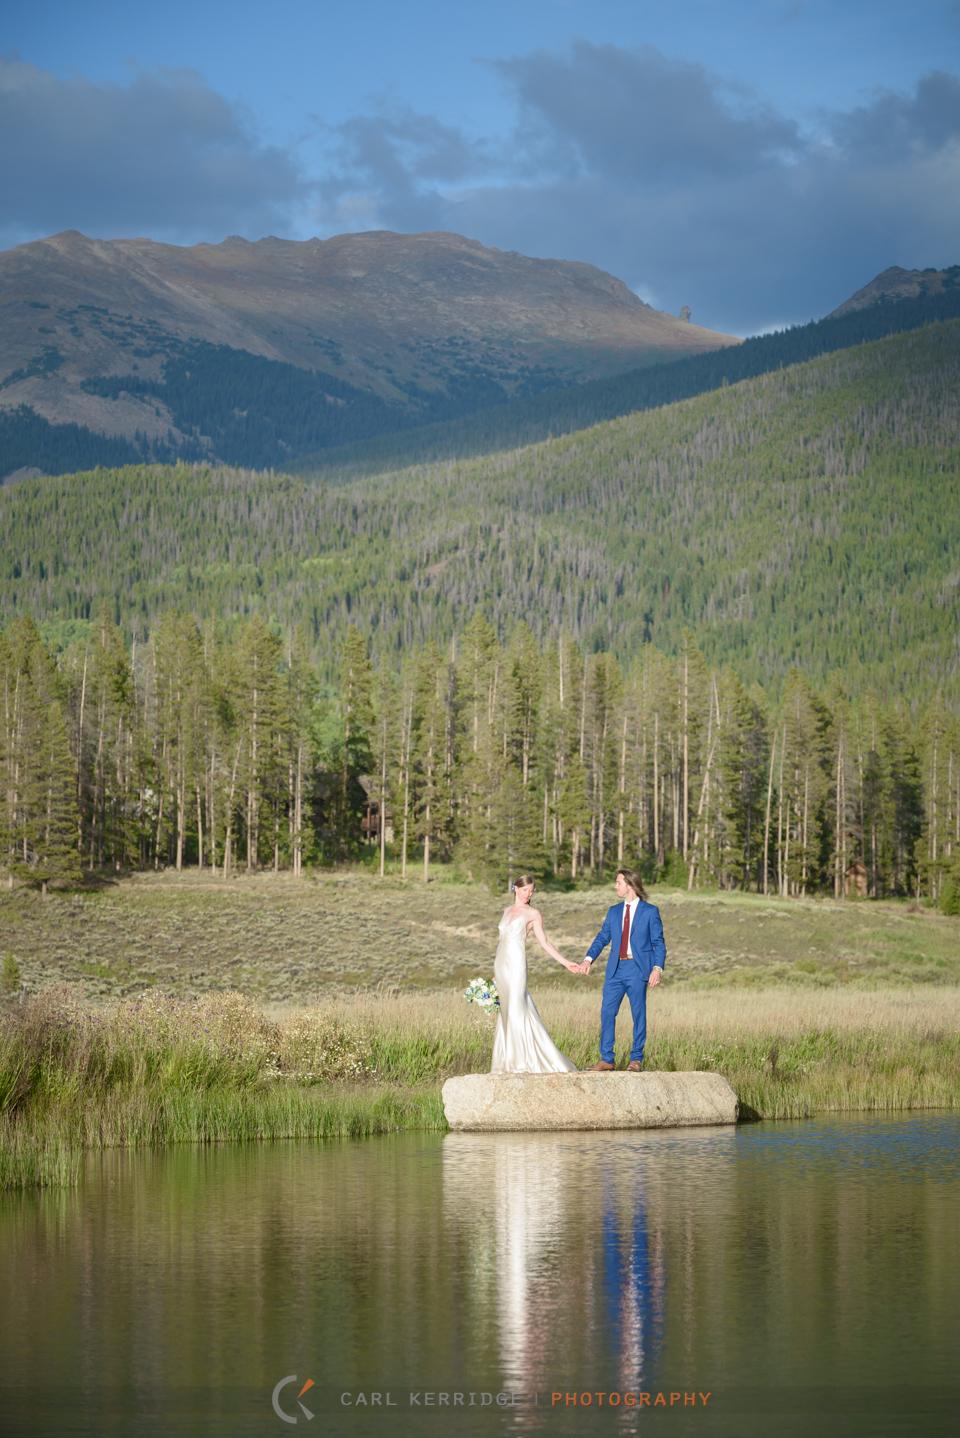 carl-kerridge-photography-wedding-devils-thumb-ranch-colorado-27